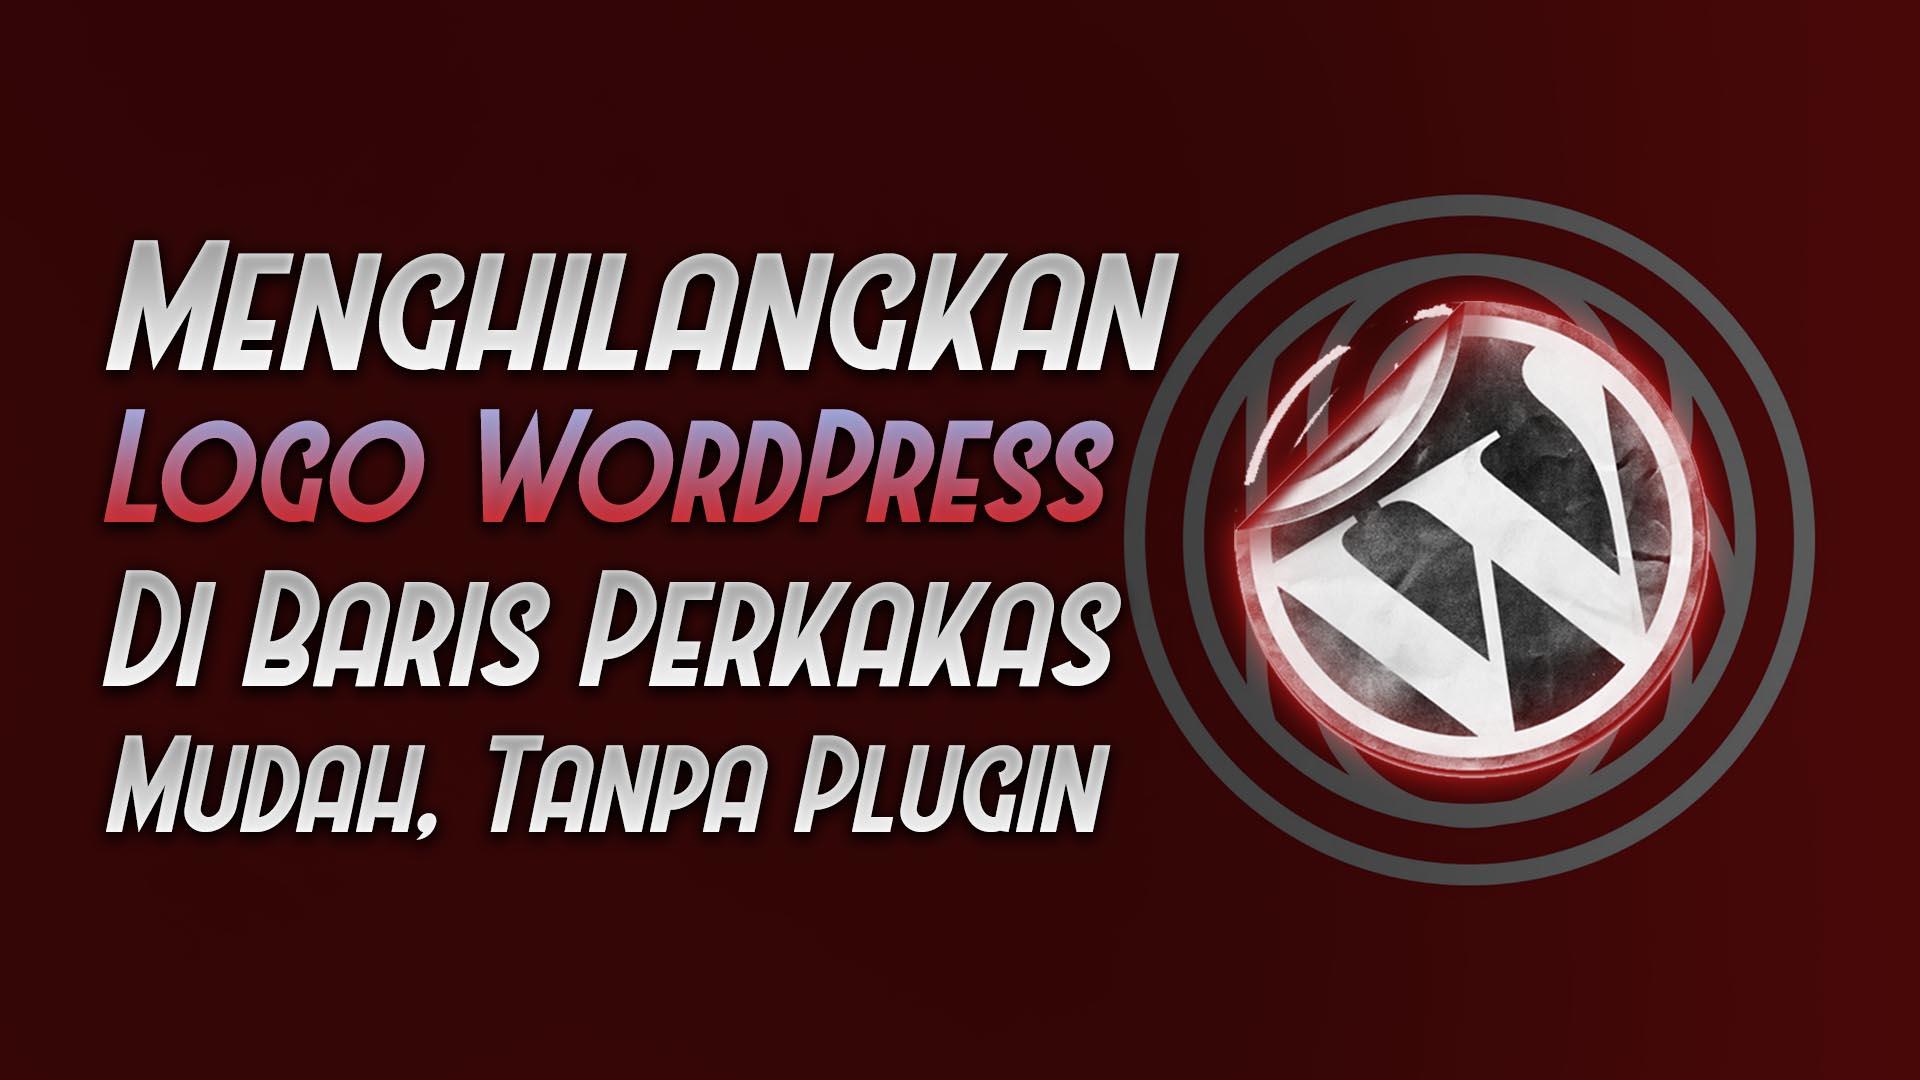 hilangkan logo wordpress dasbor admin bari - rio bermano